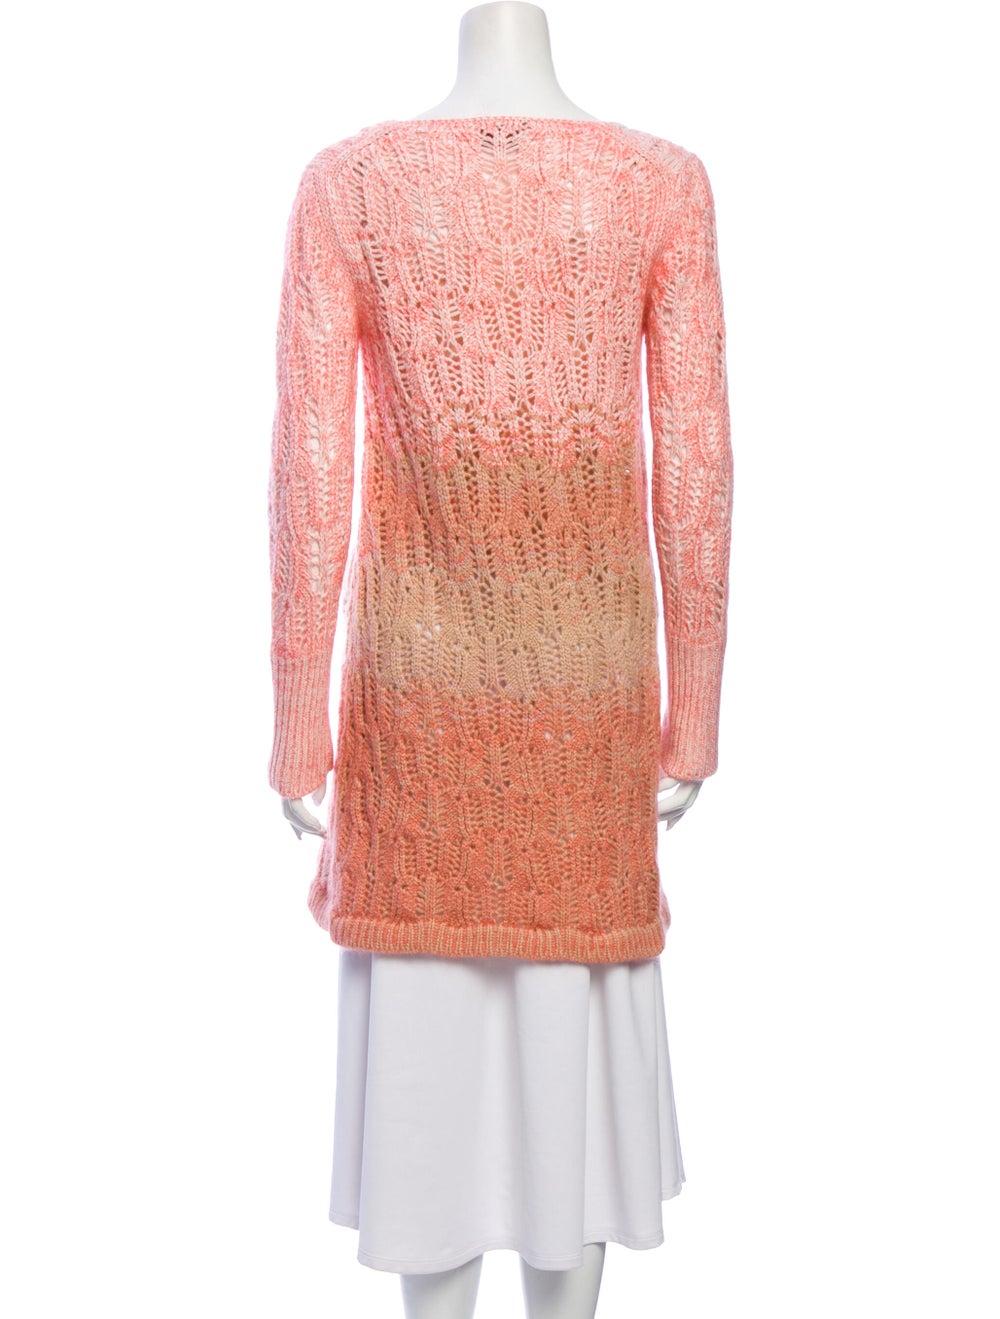 Missoni Cashmere Tie-Dye Print Sweater Pink - image 3